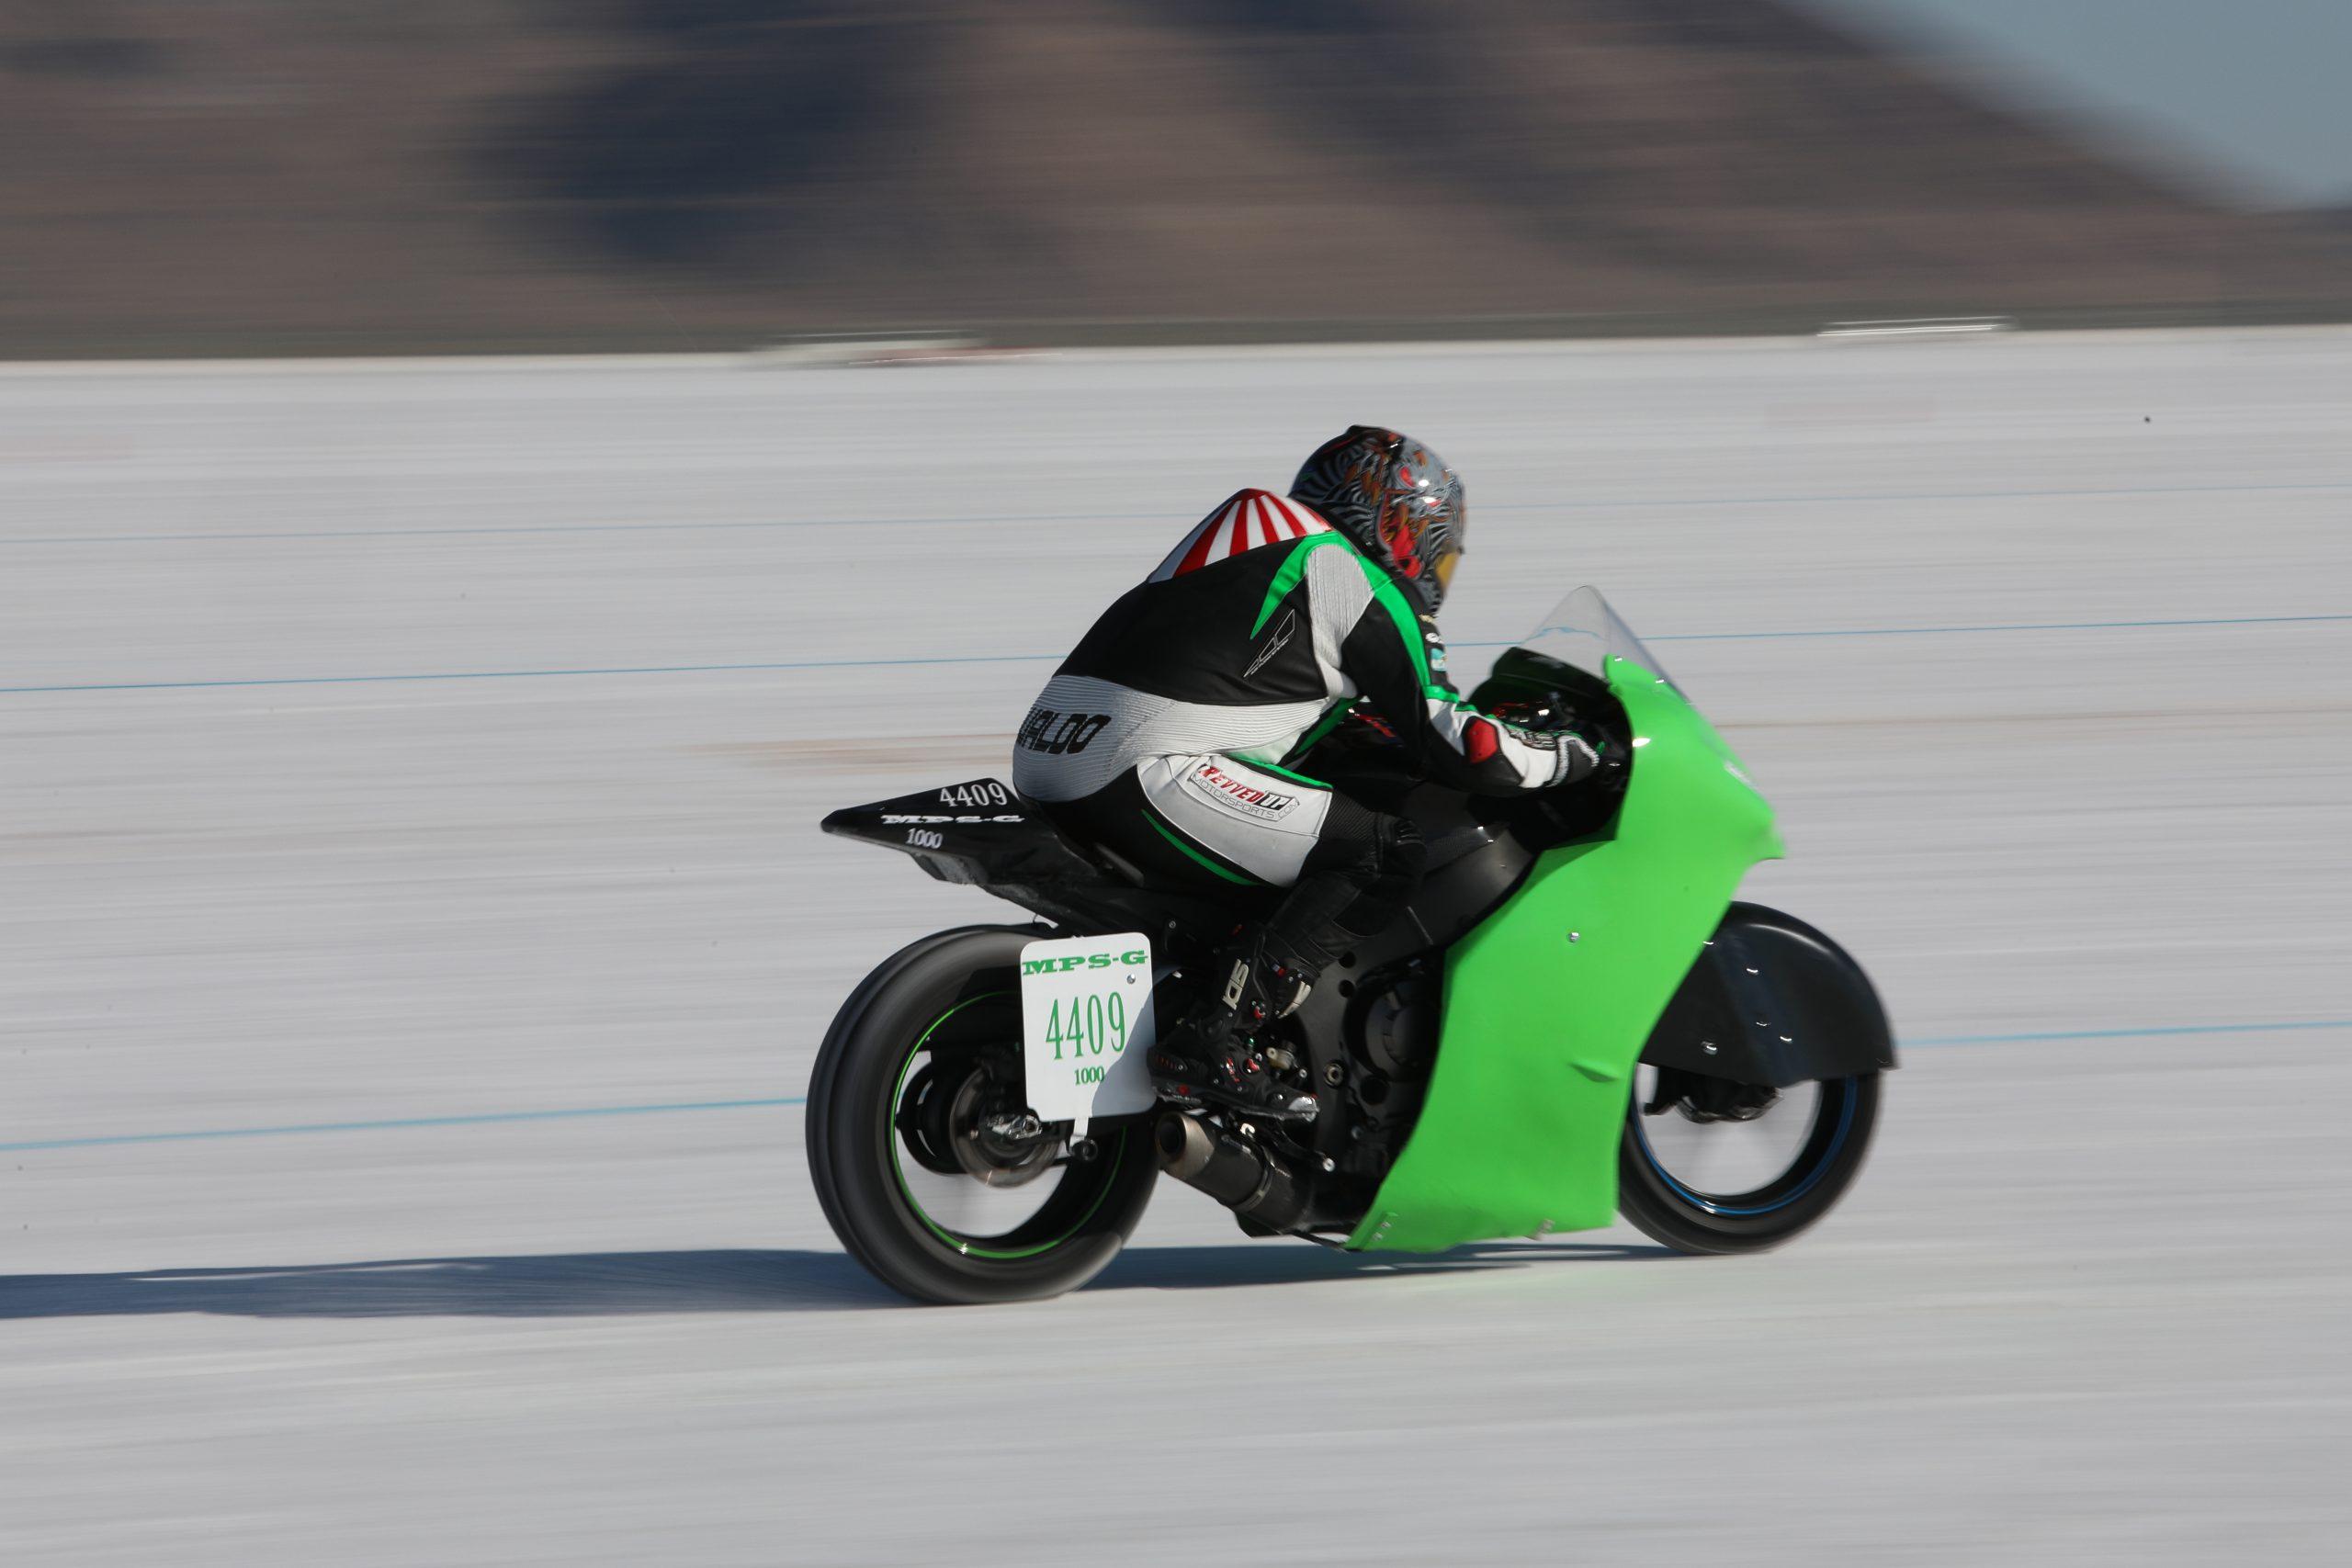 Bonneville Speed Week 2020